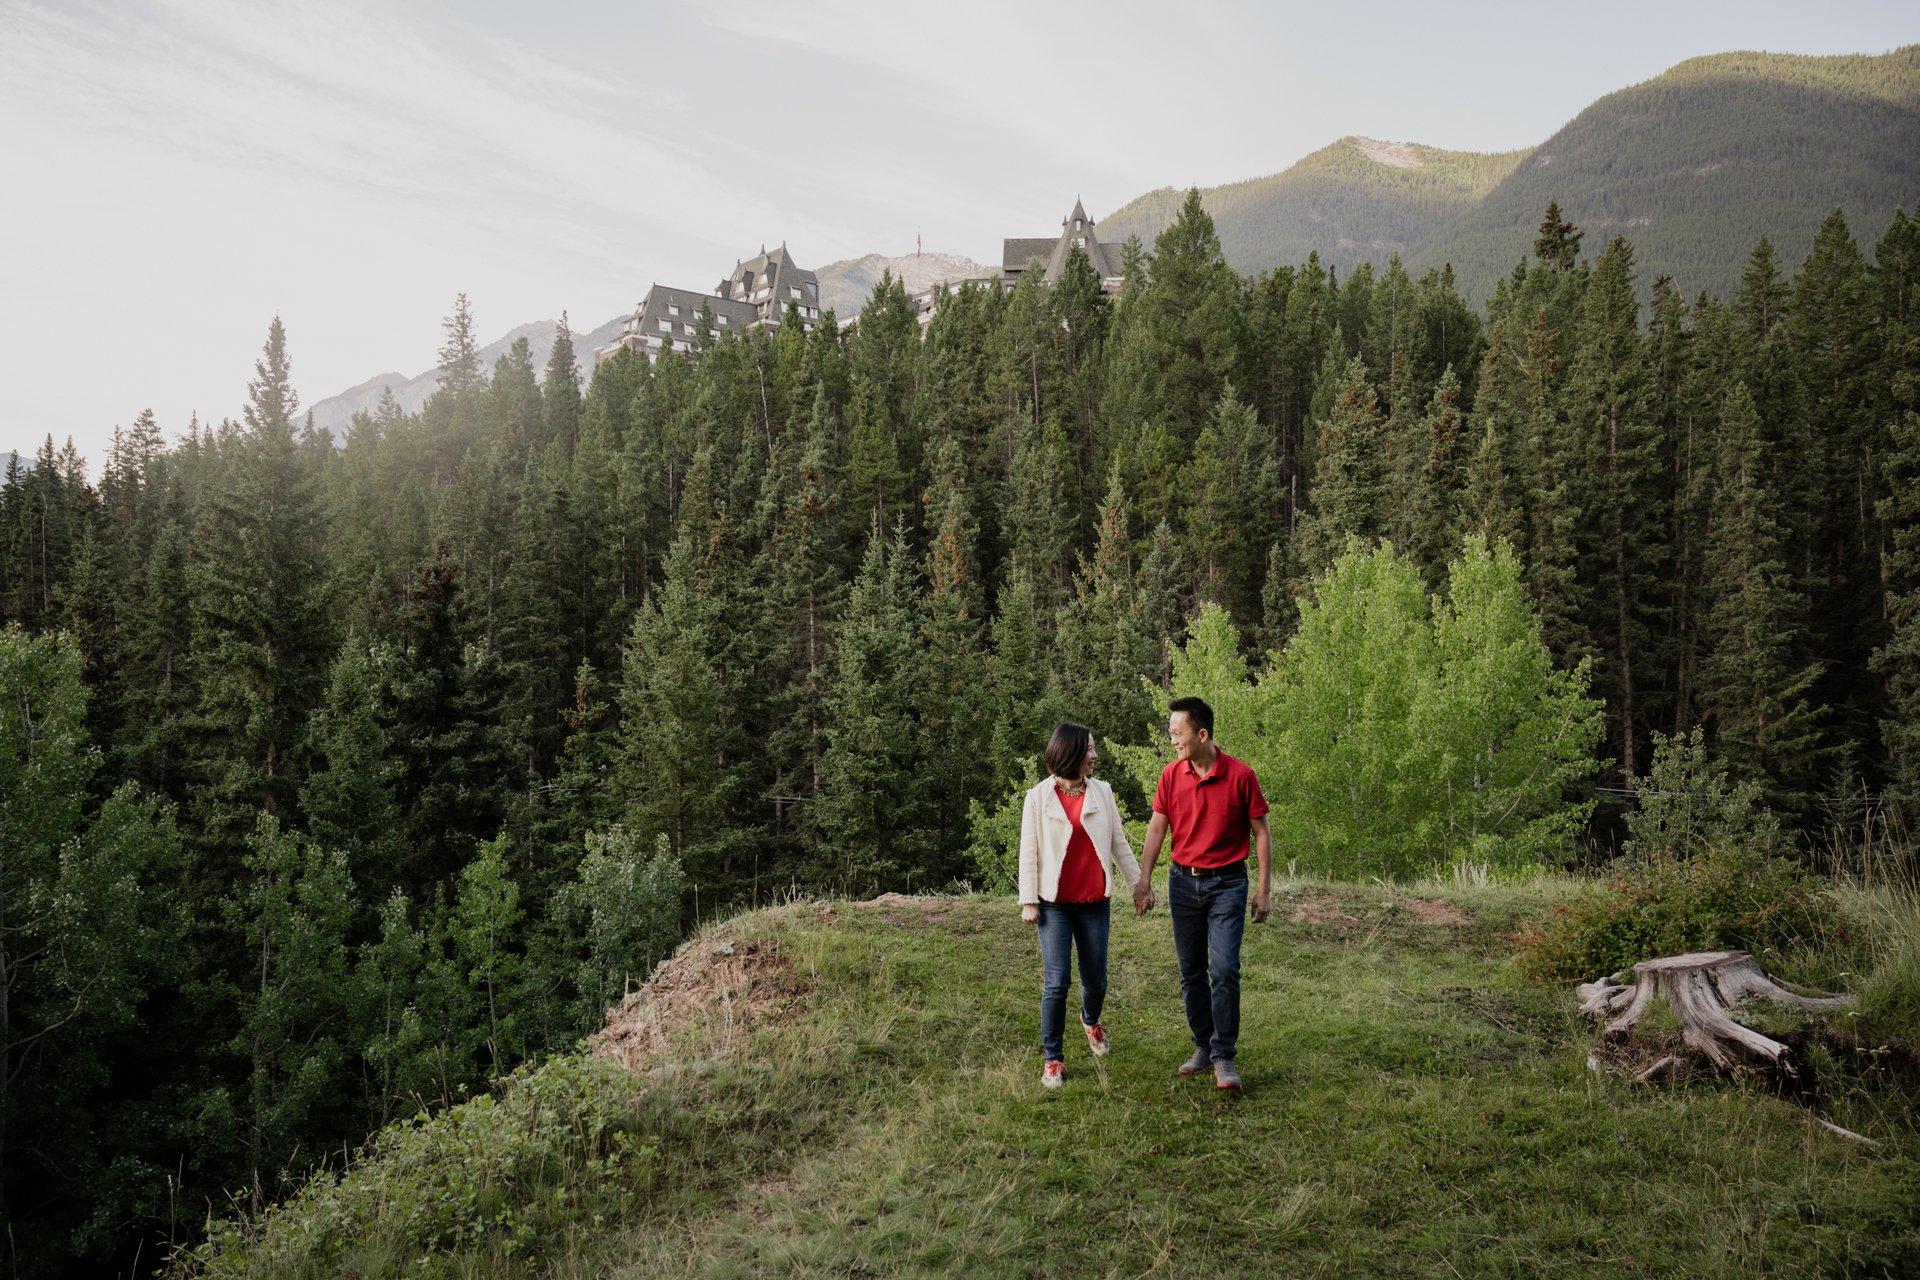 Banff-Canada-travel-story-Flytographer-5